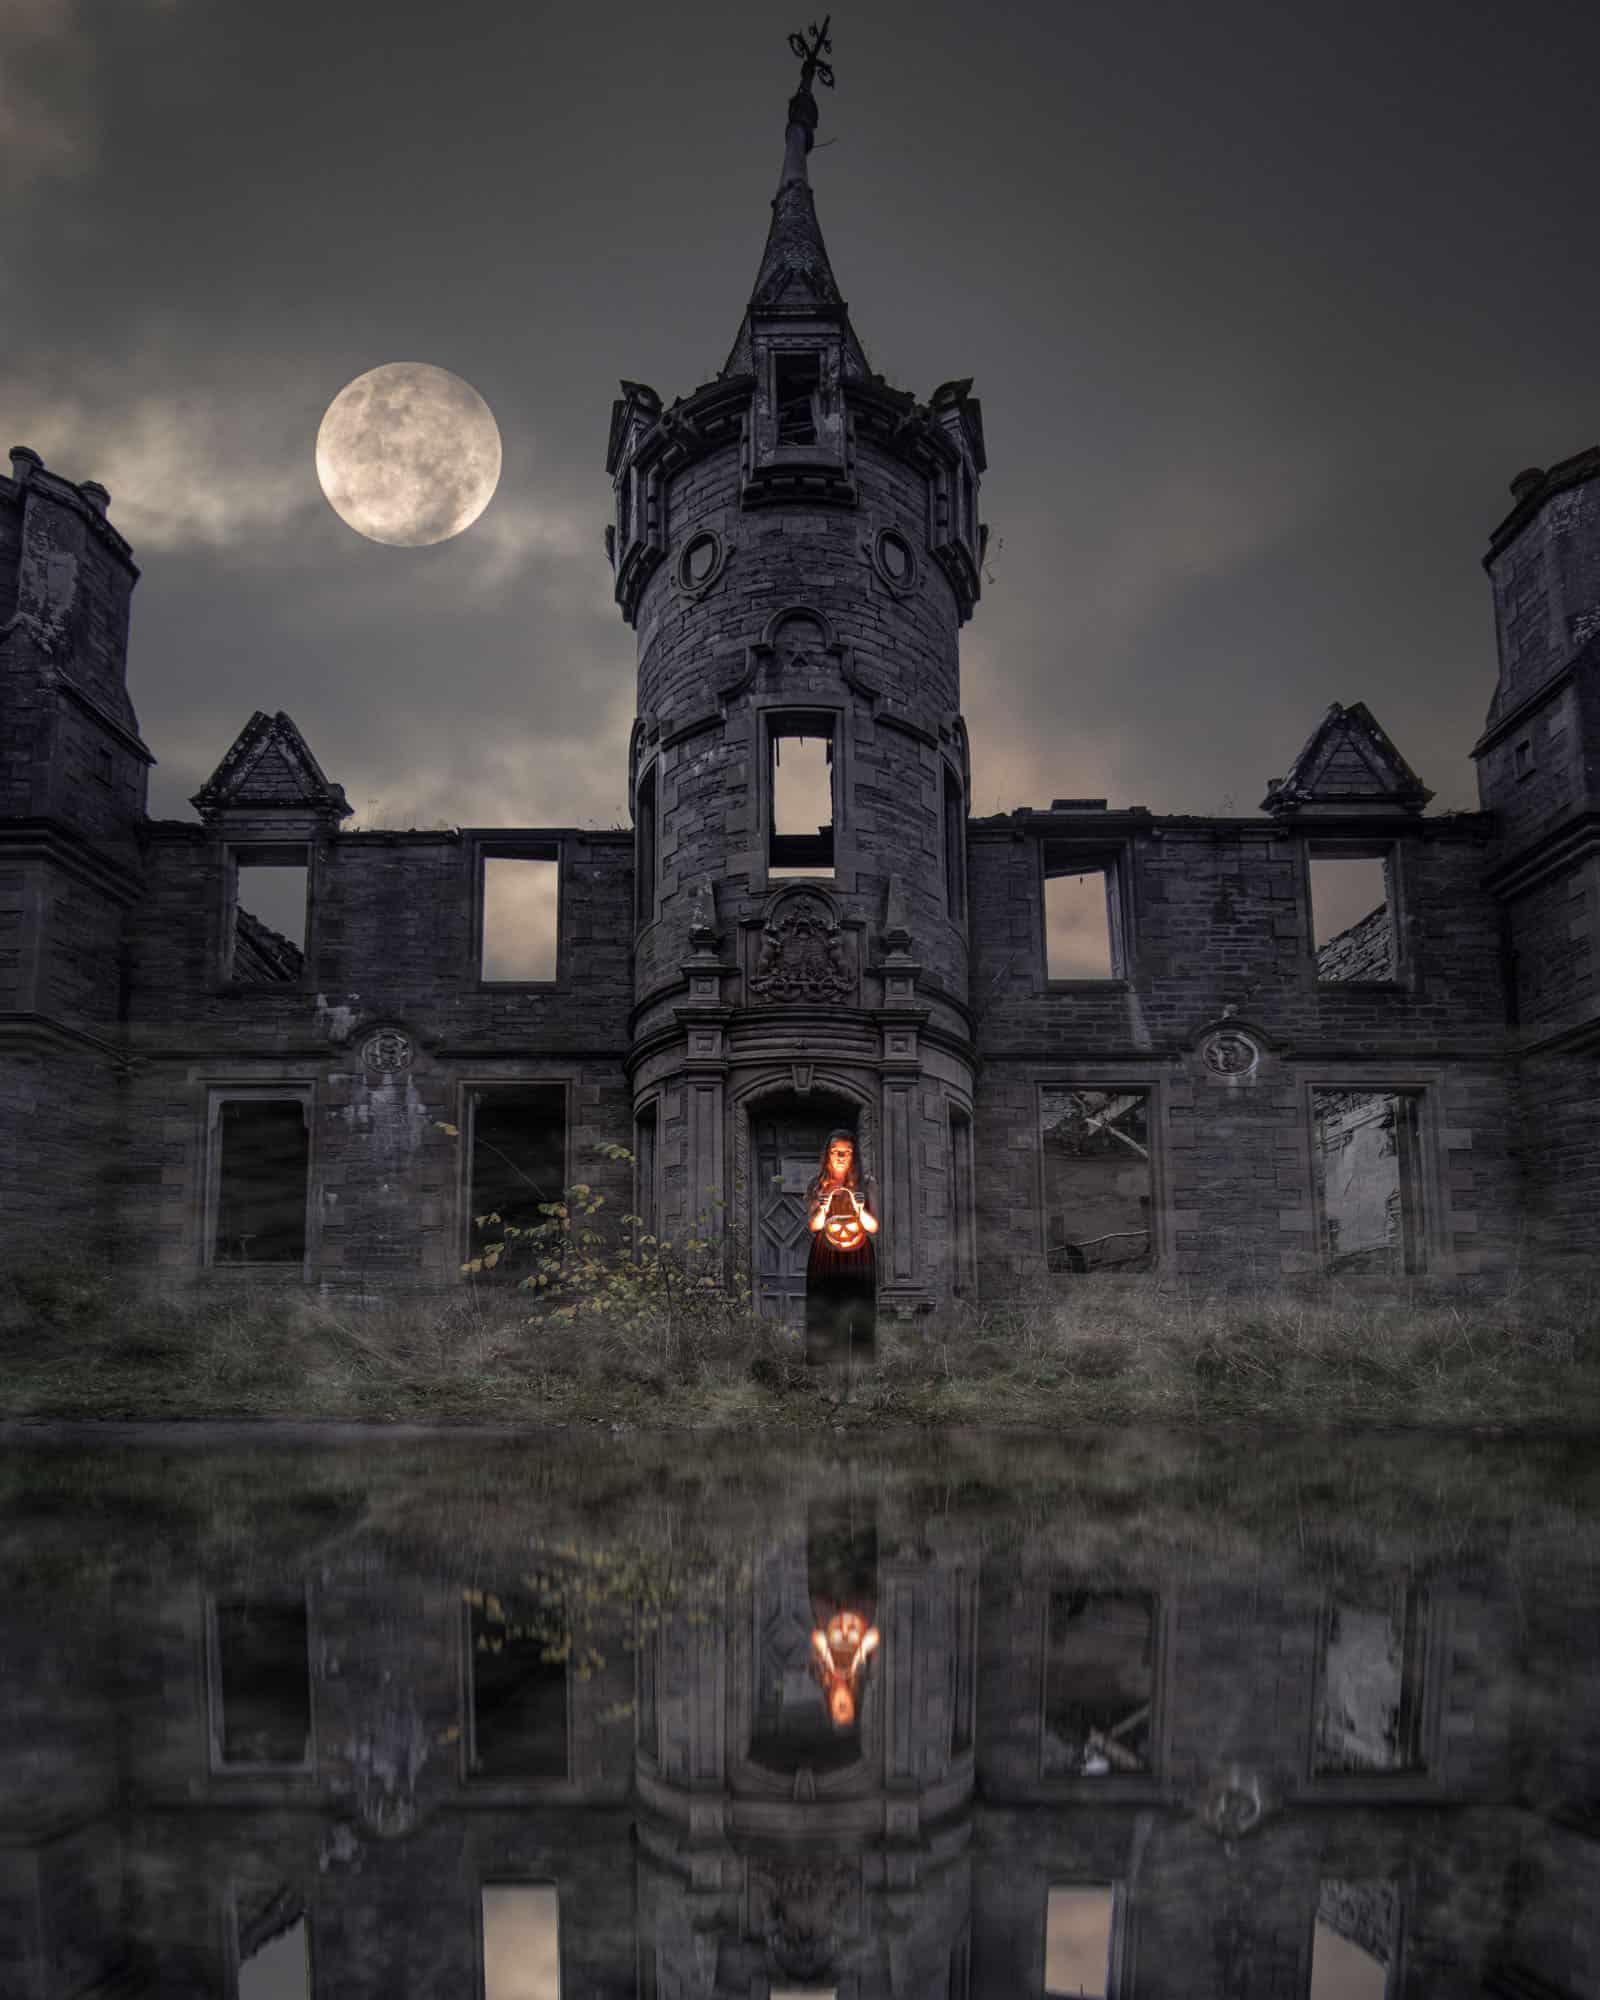 A spooky night scene at Dunalastair Castle, the best castle in Scotland.